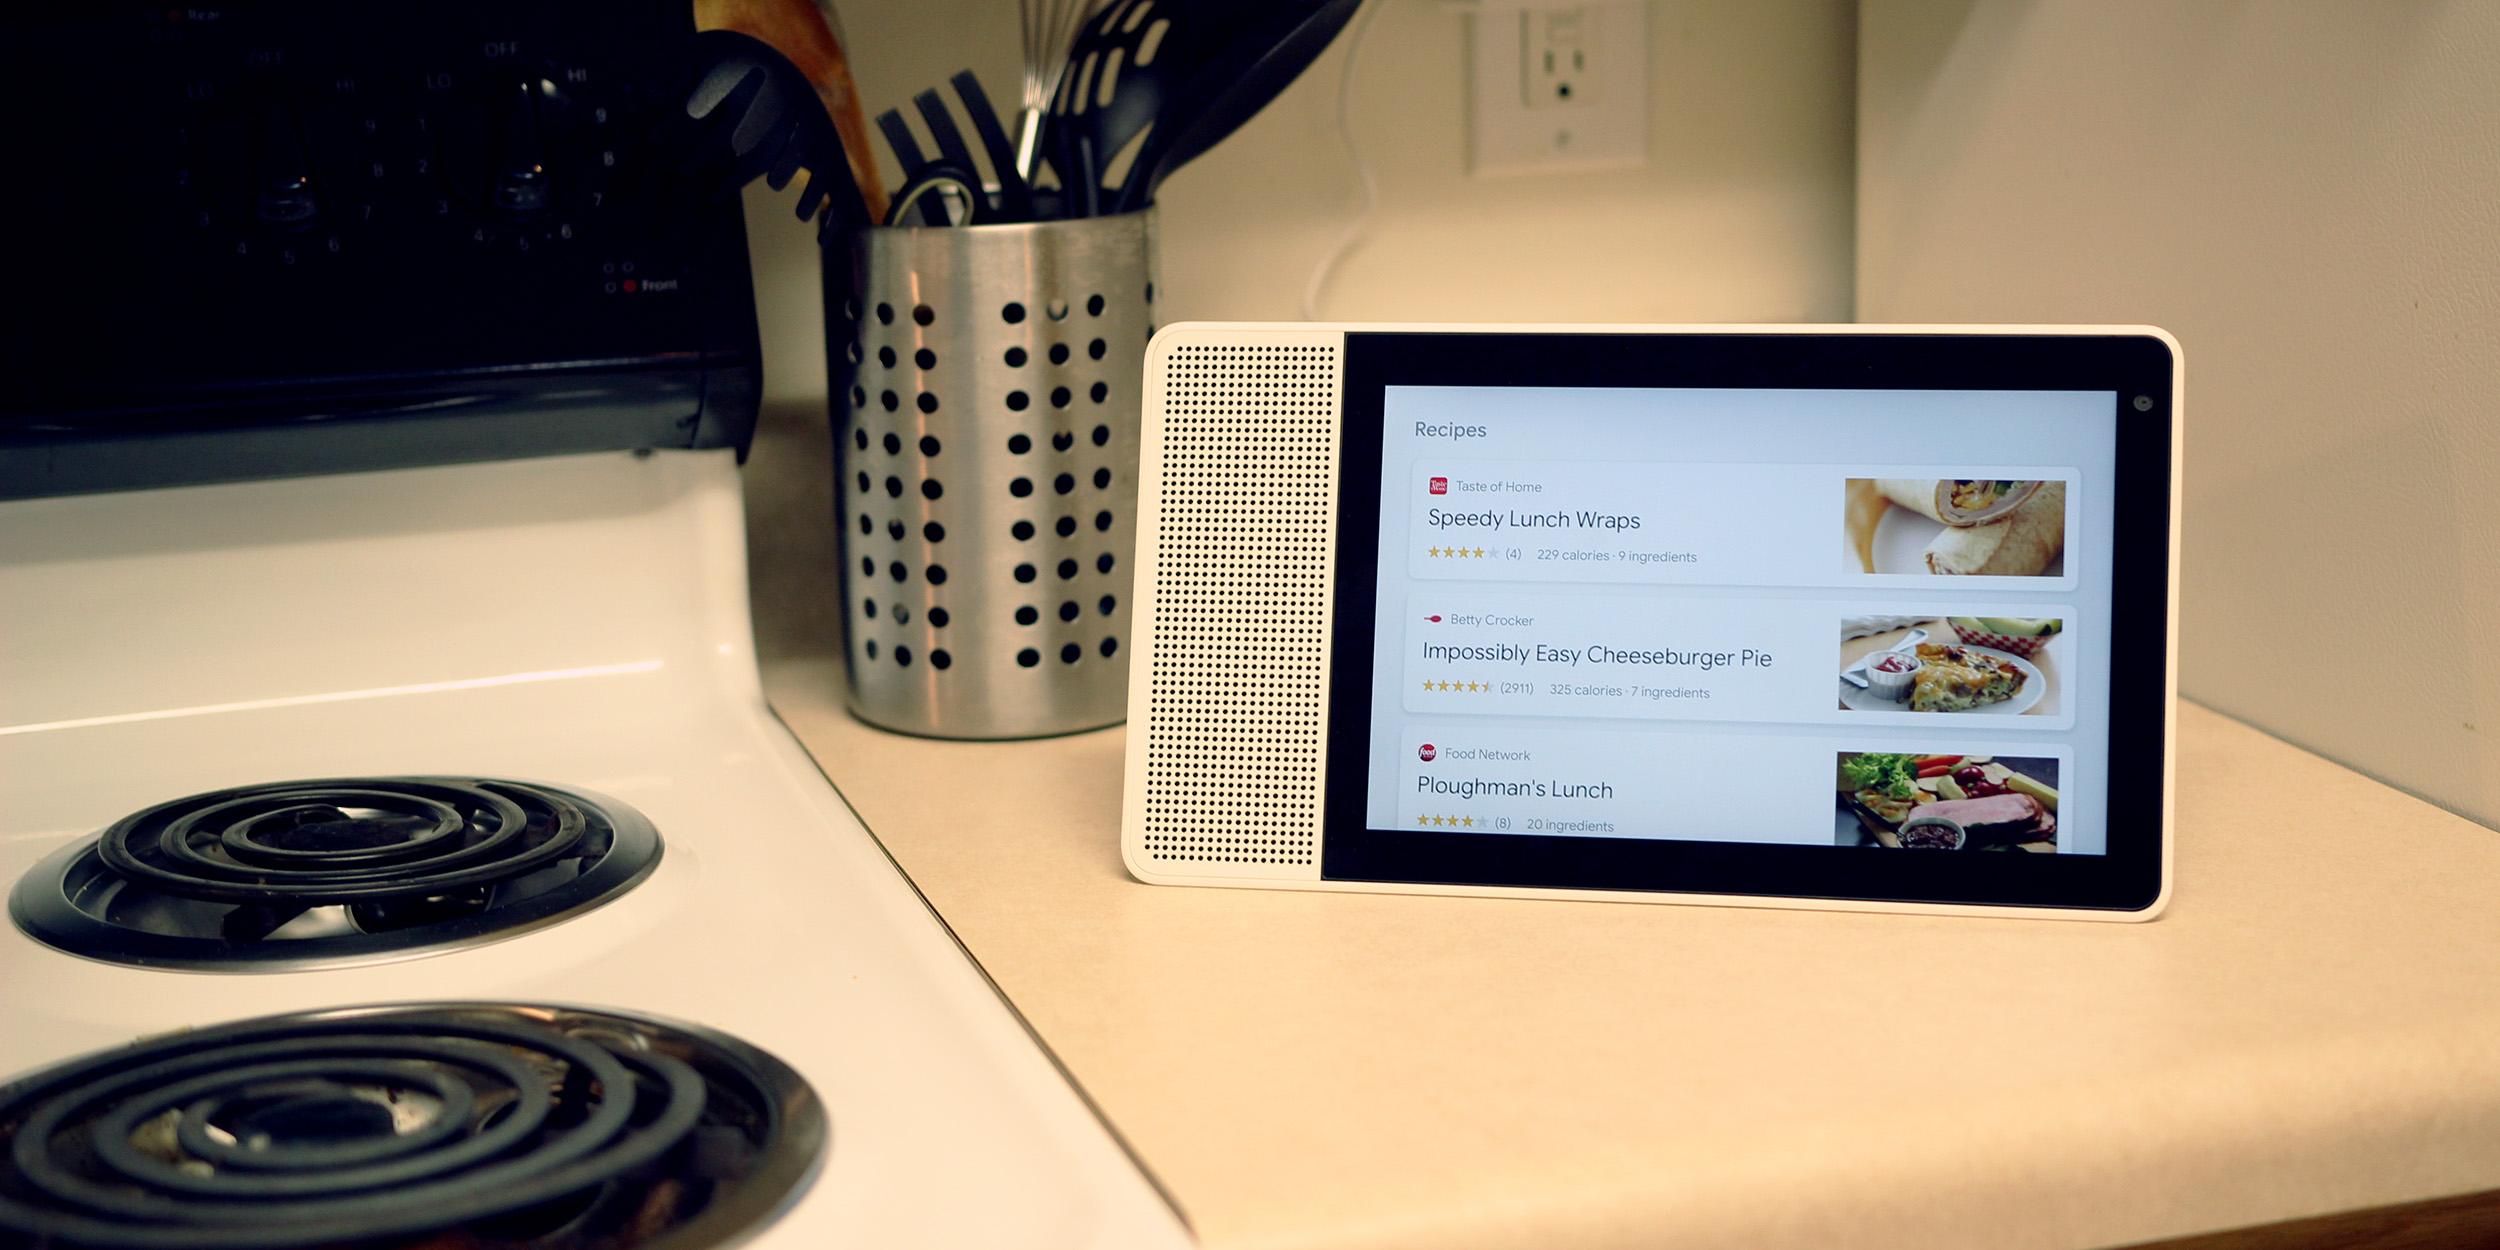 lenovo smart display kitchen